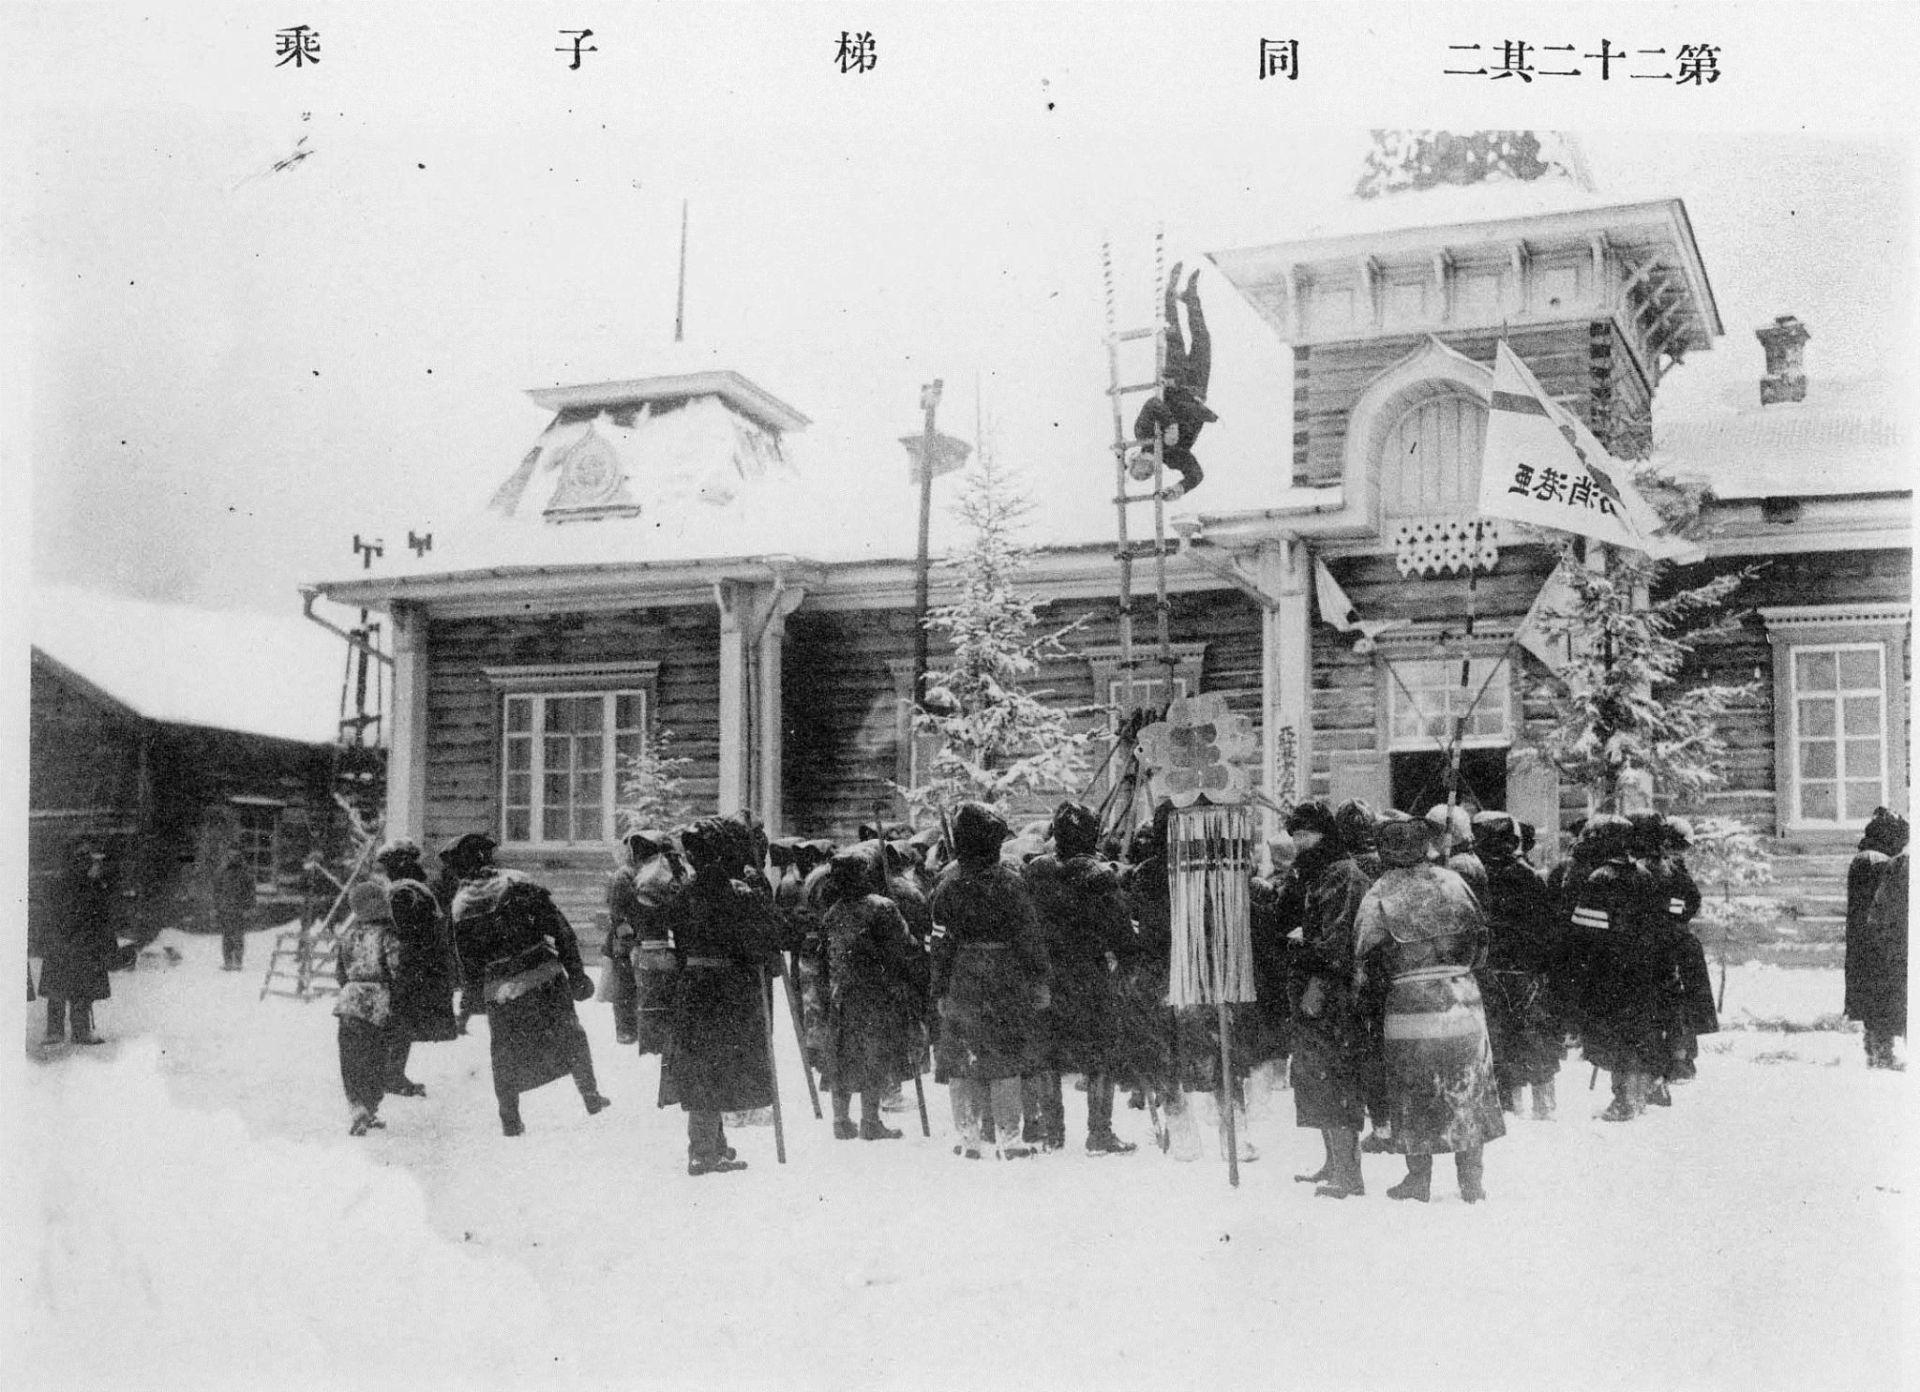 22 апреля — 101 год назад началась оккупация Северного Сахалина японцами